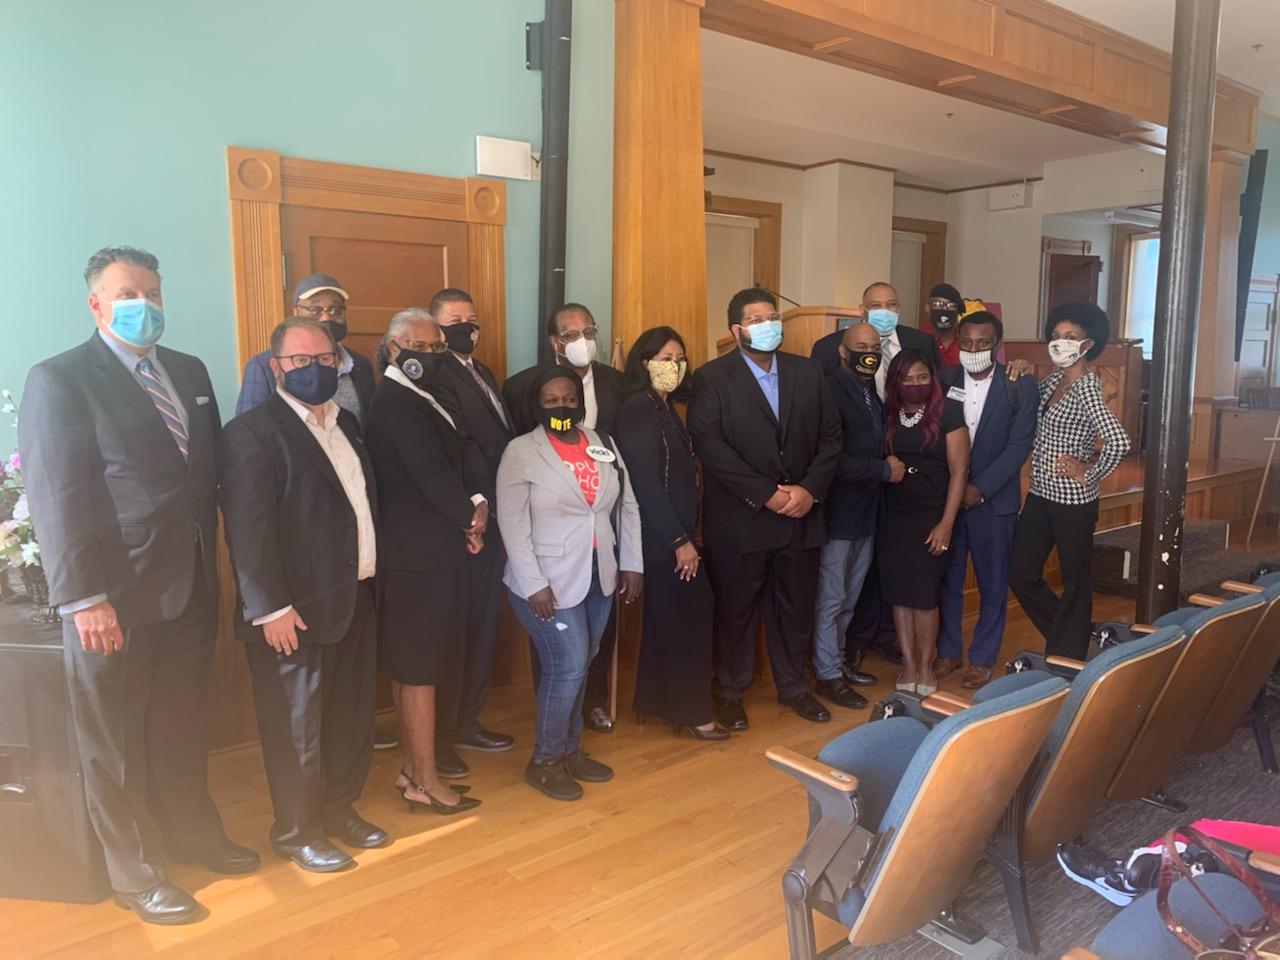 Derek Olivier's Research Institute (DORI) at Arkansas Baptist College program participants and guests